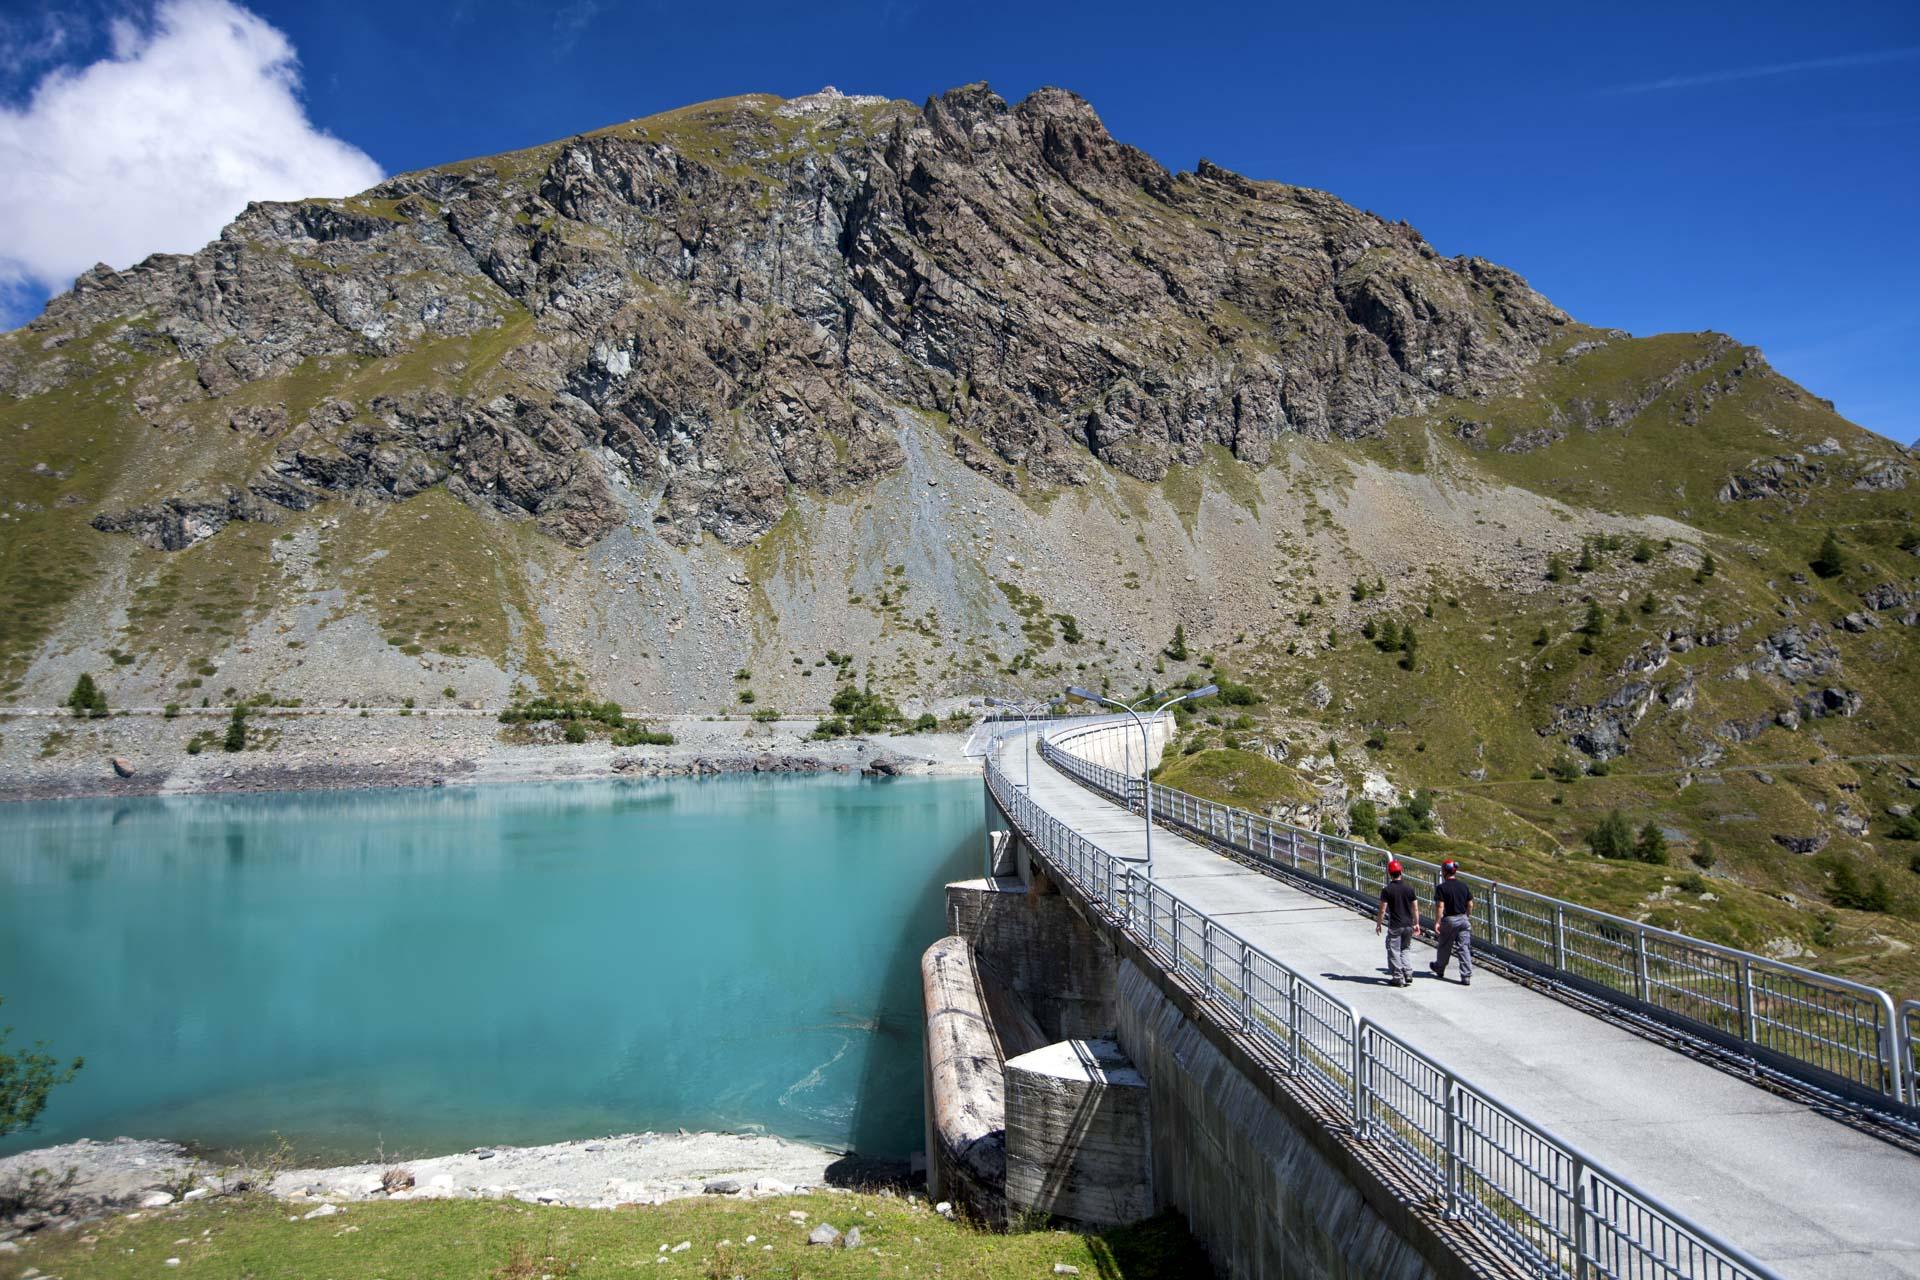 Diga Cignana Impianto energia rinnovabile idroelettrico Gruppo CVA